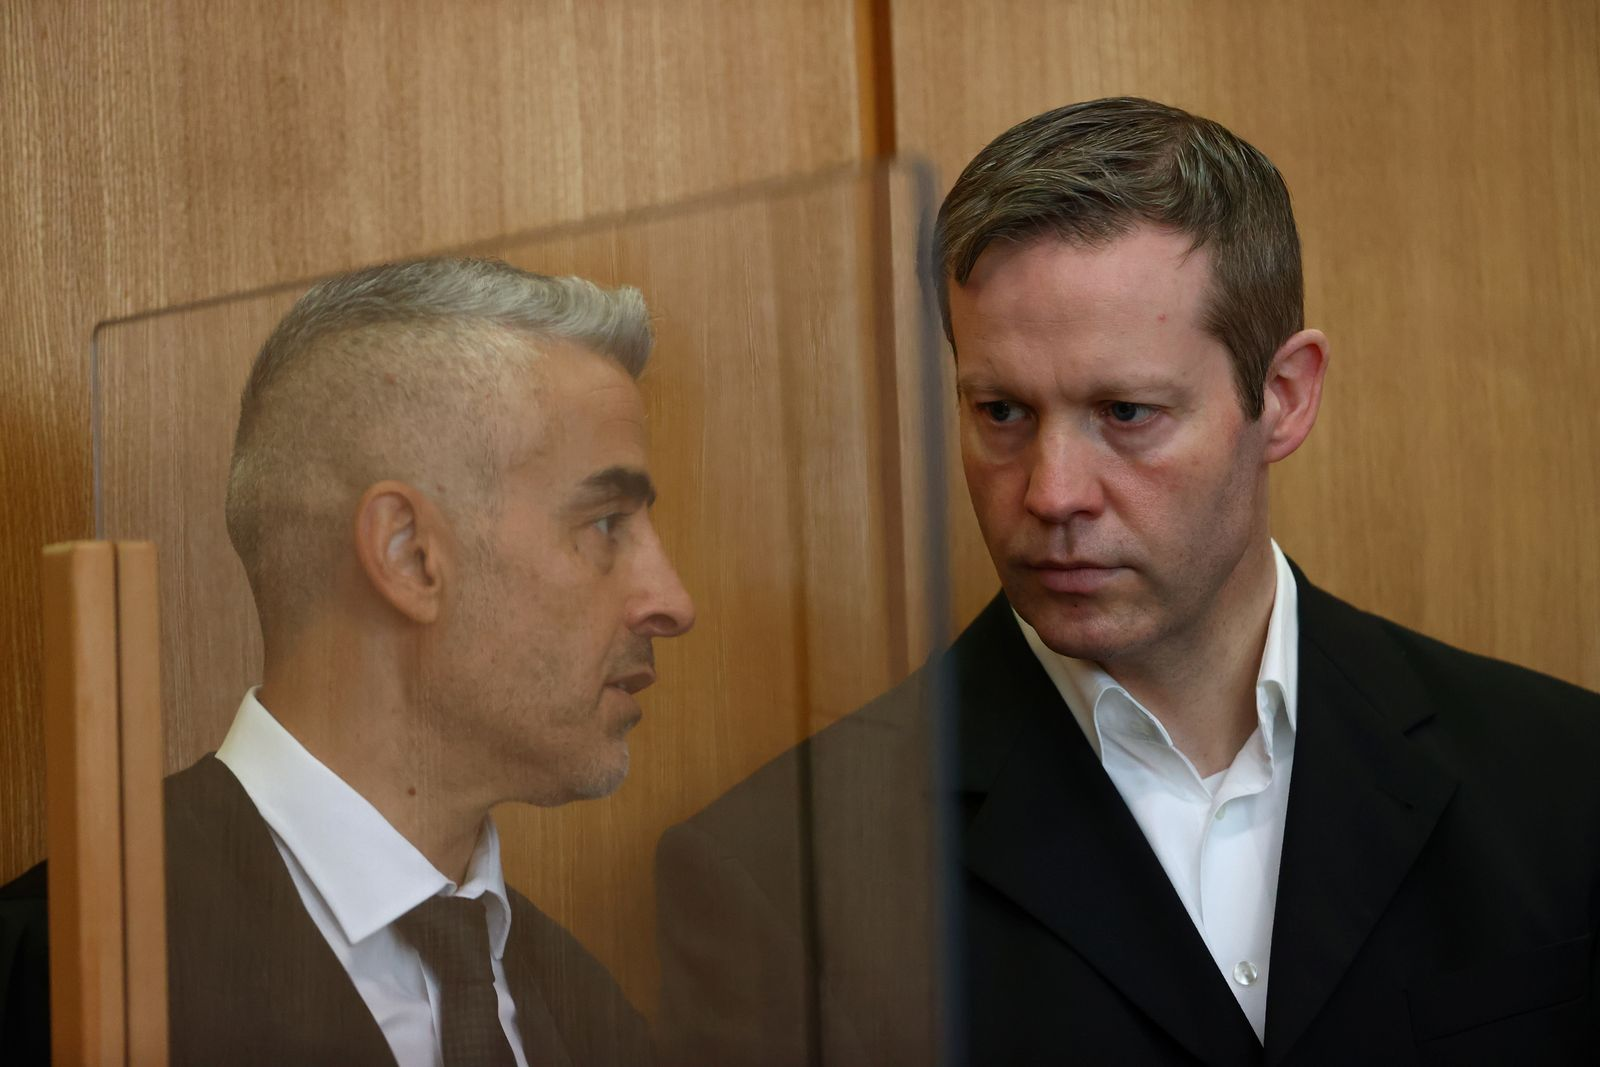 Trial against suspected Walter Luebcke murderer continues, in Frankfurt